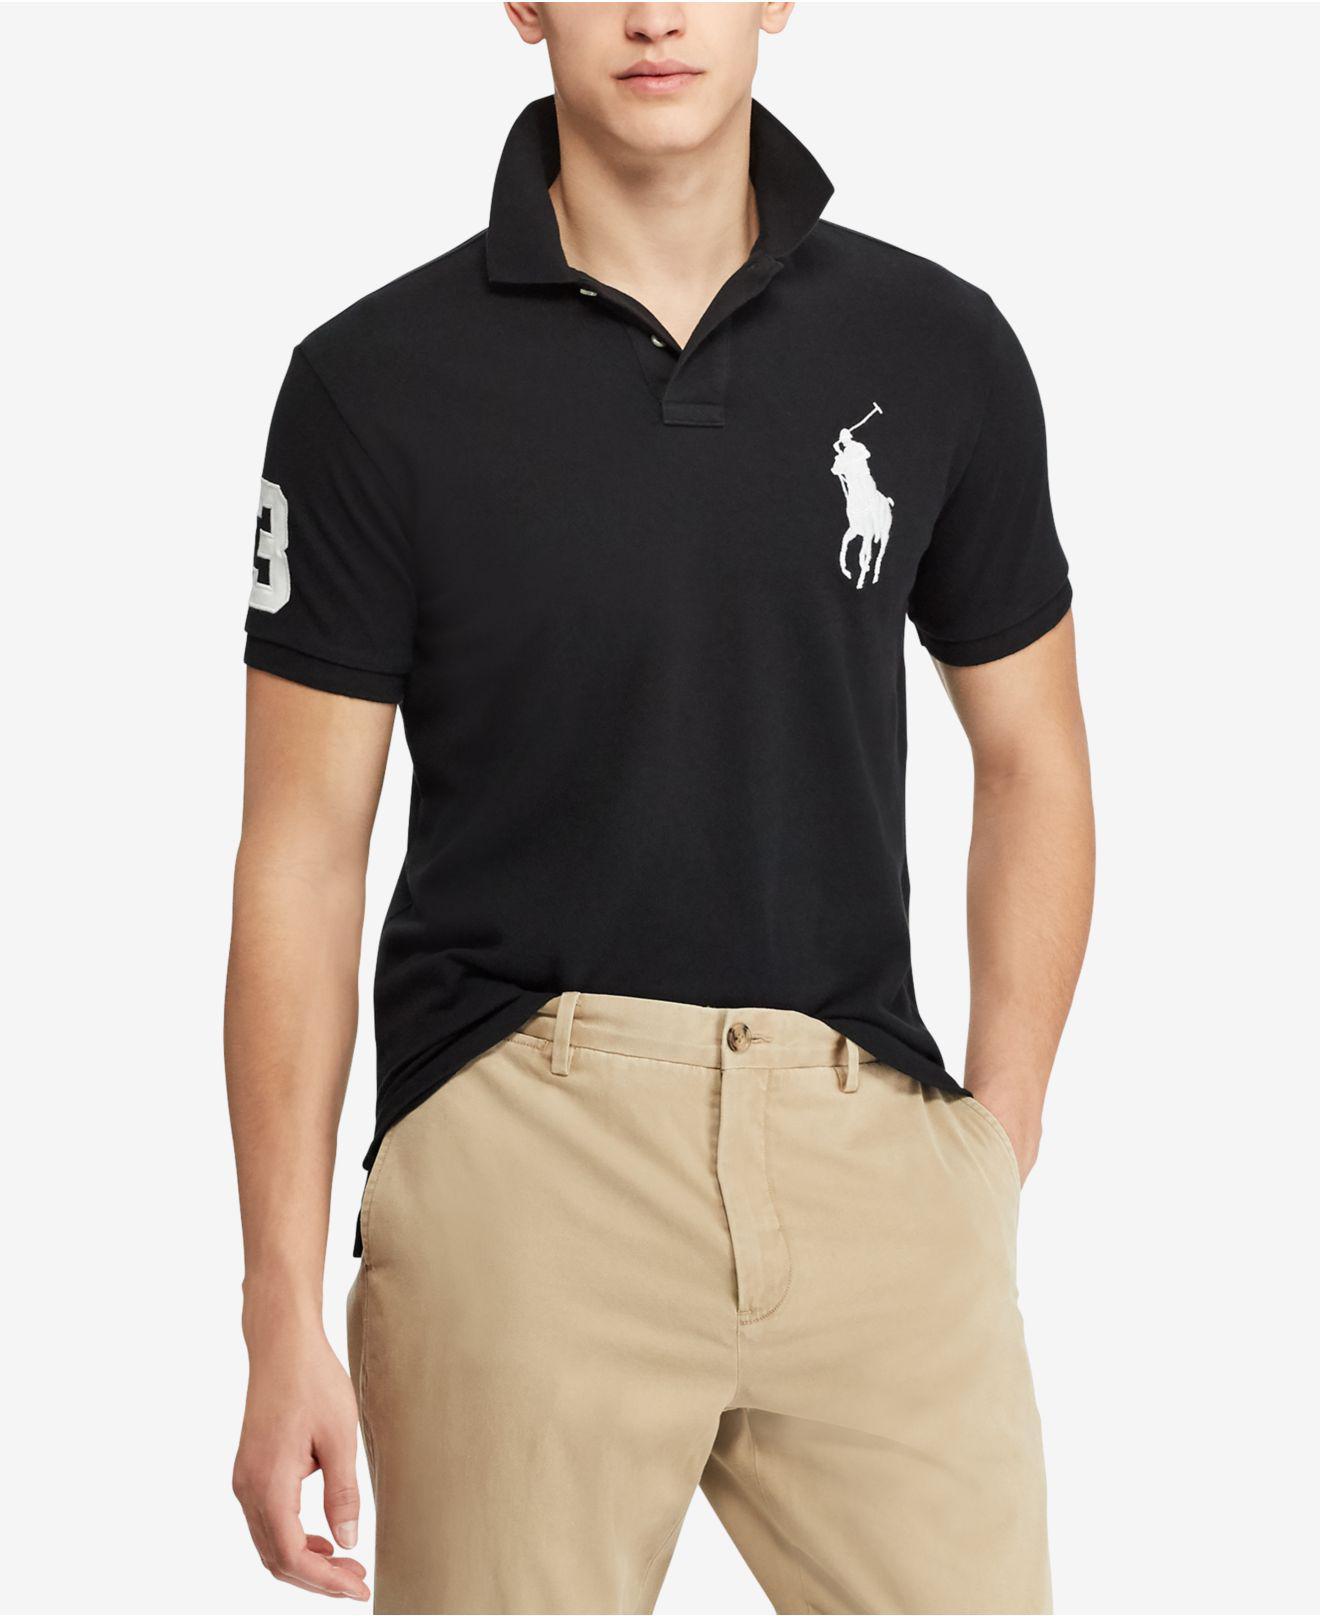 46fd3fb0 Lyst - Polo Ralph Lauren Custom Slim Fit Polo Shirt in Black for Men ...